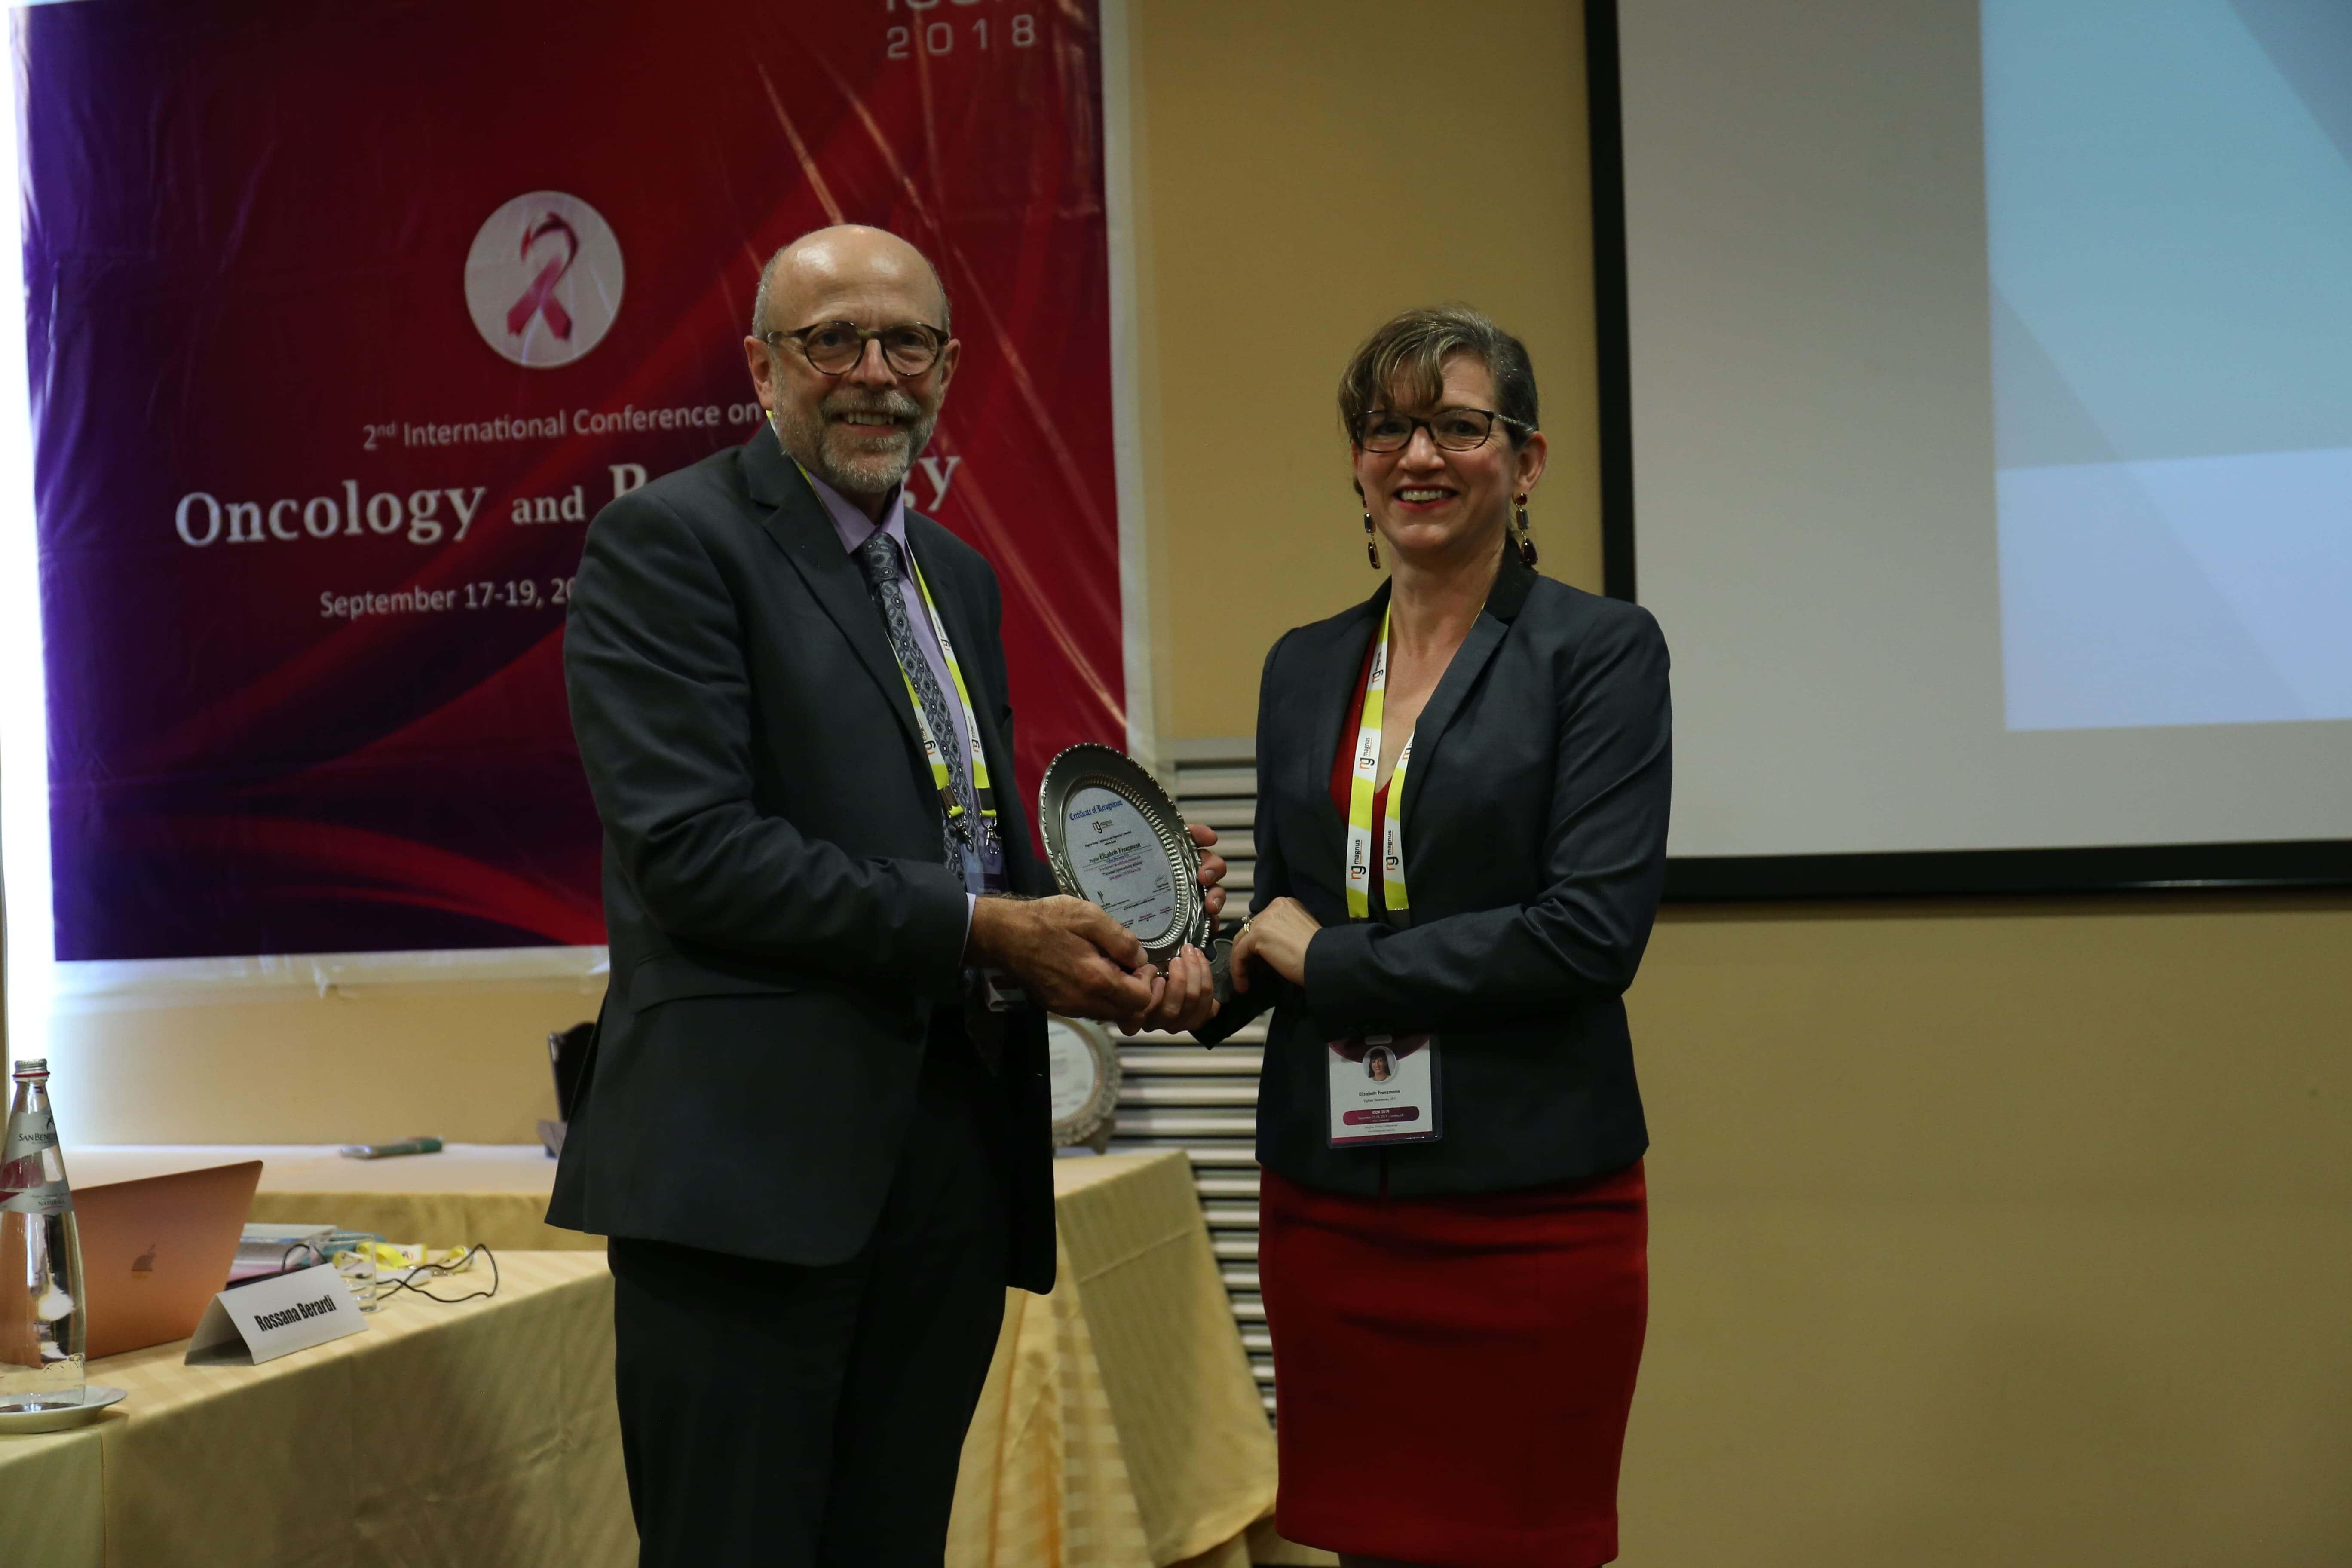 Cancer education conferences - Elizabeth Franzmann